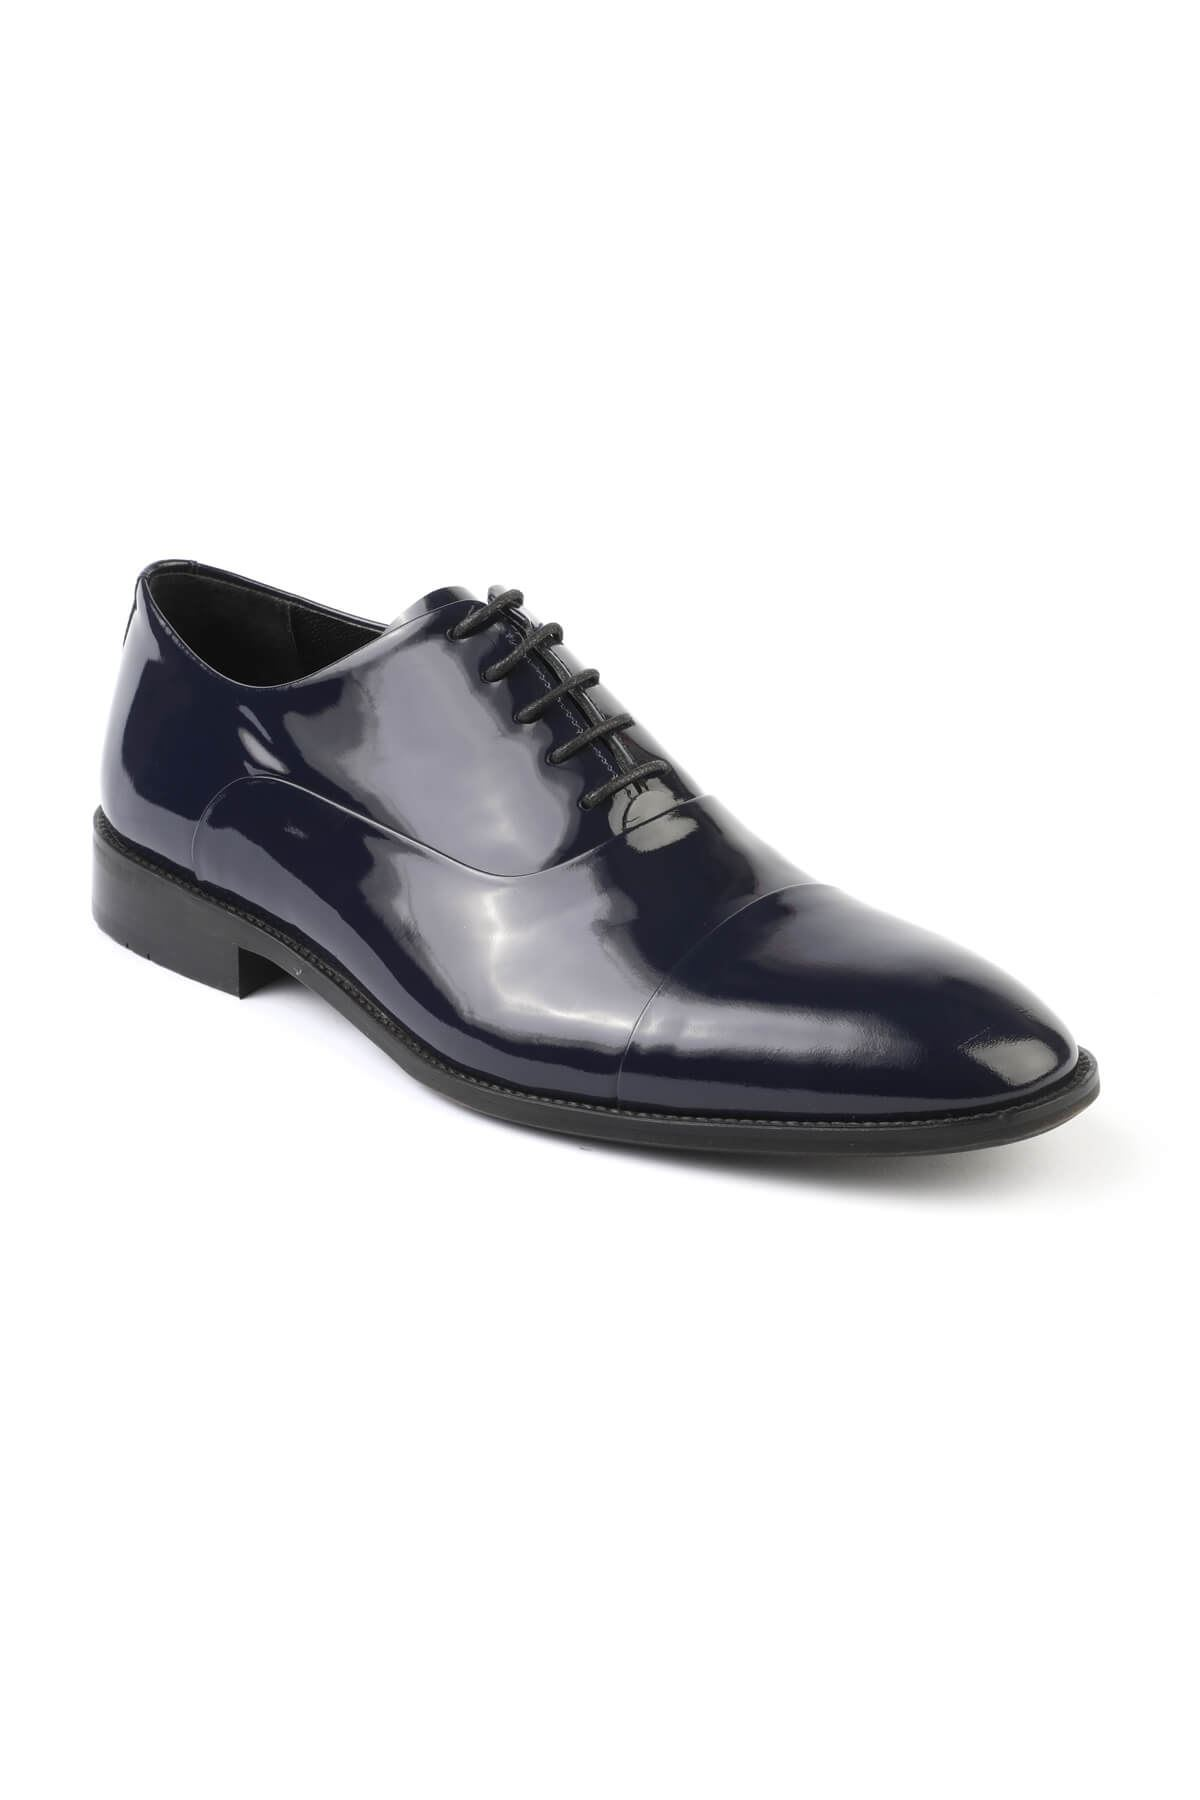 Libero T365 Lacivert Klasik Ayakkabı